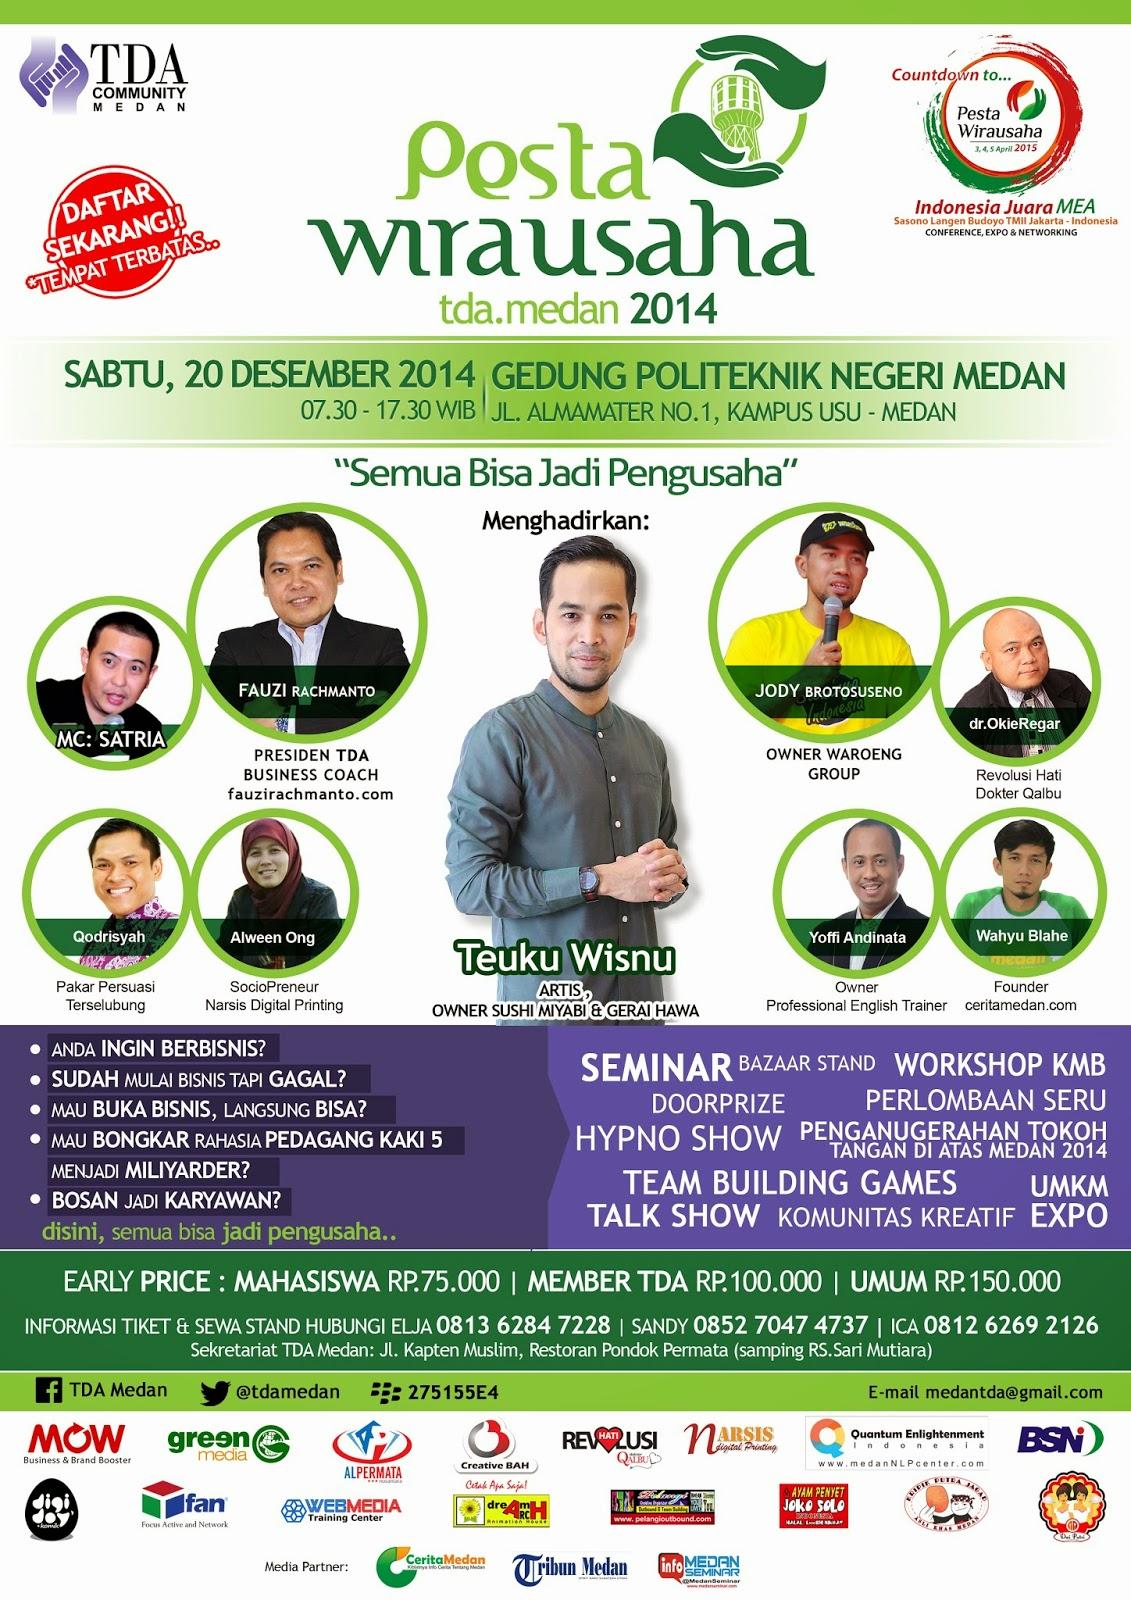 Pesta Wirausaha TDA Medan 2014 : Semua Bisa Jadi Pengusaha